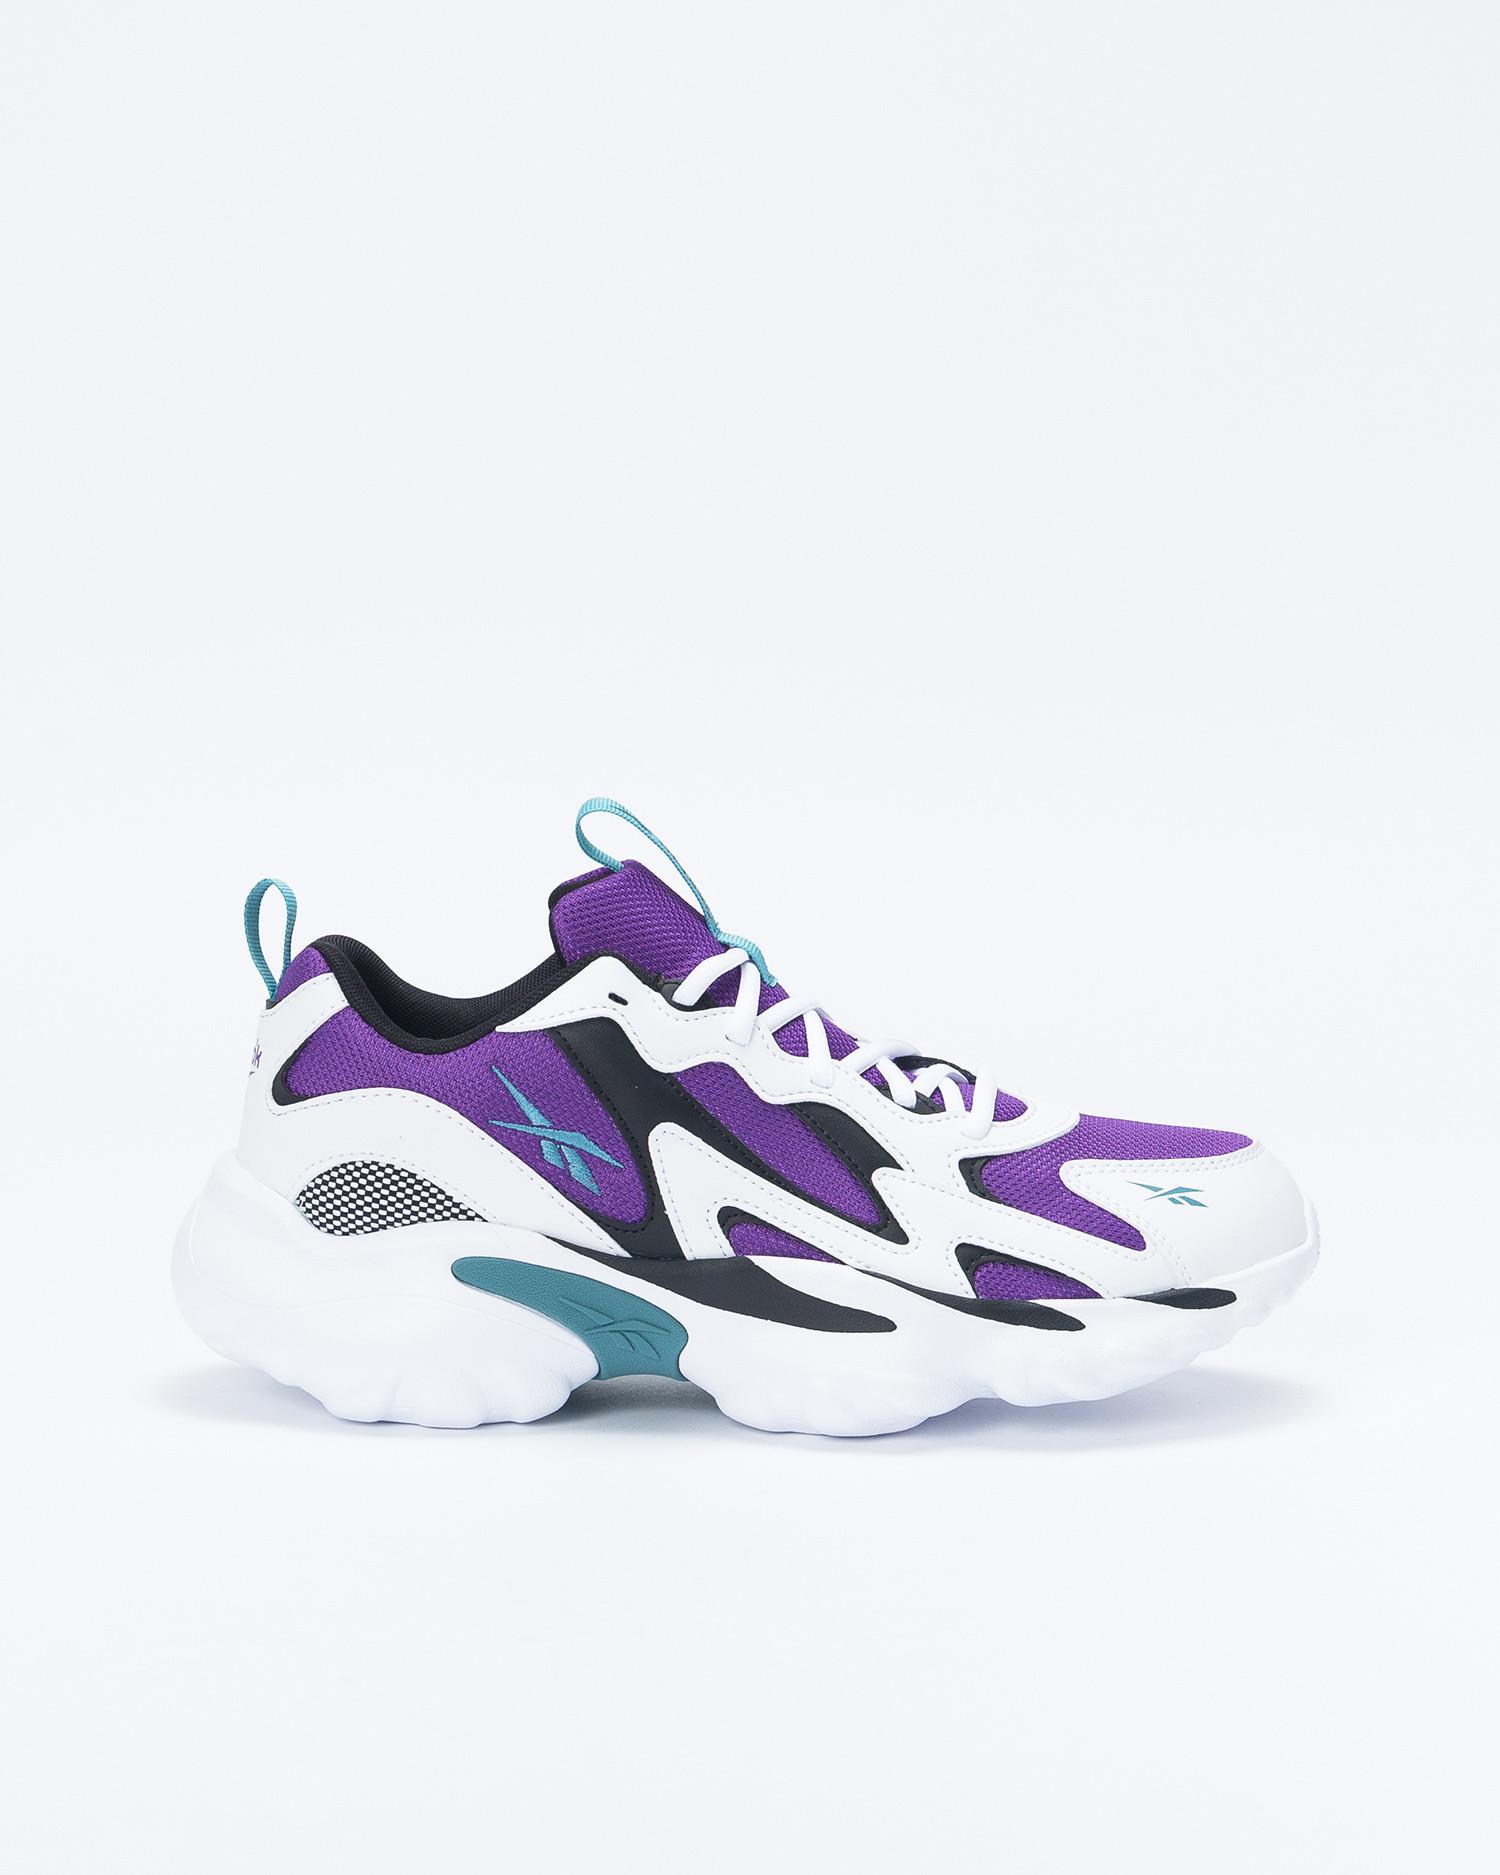 Reebok DMX Series 1000 White/Purple